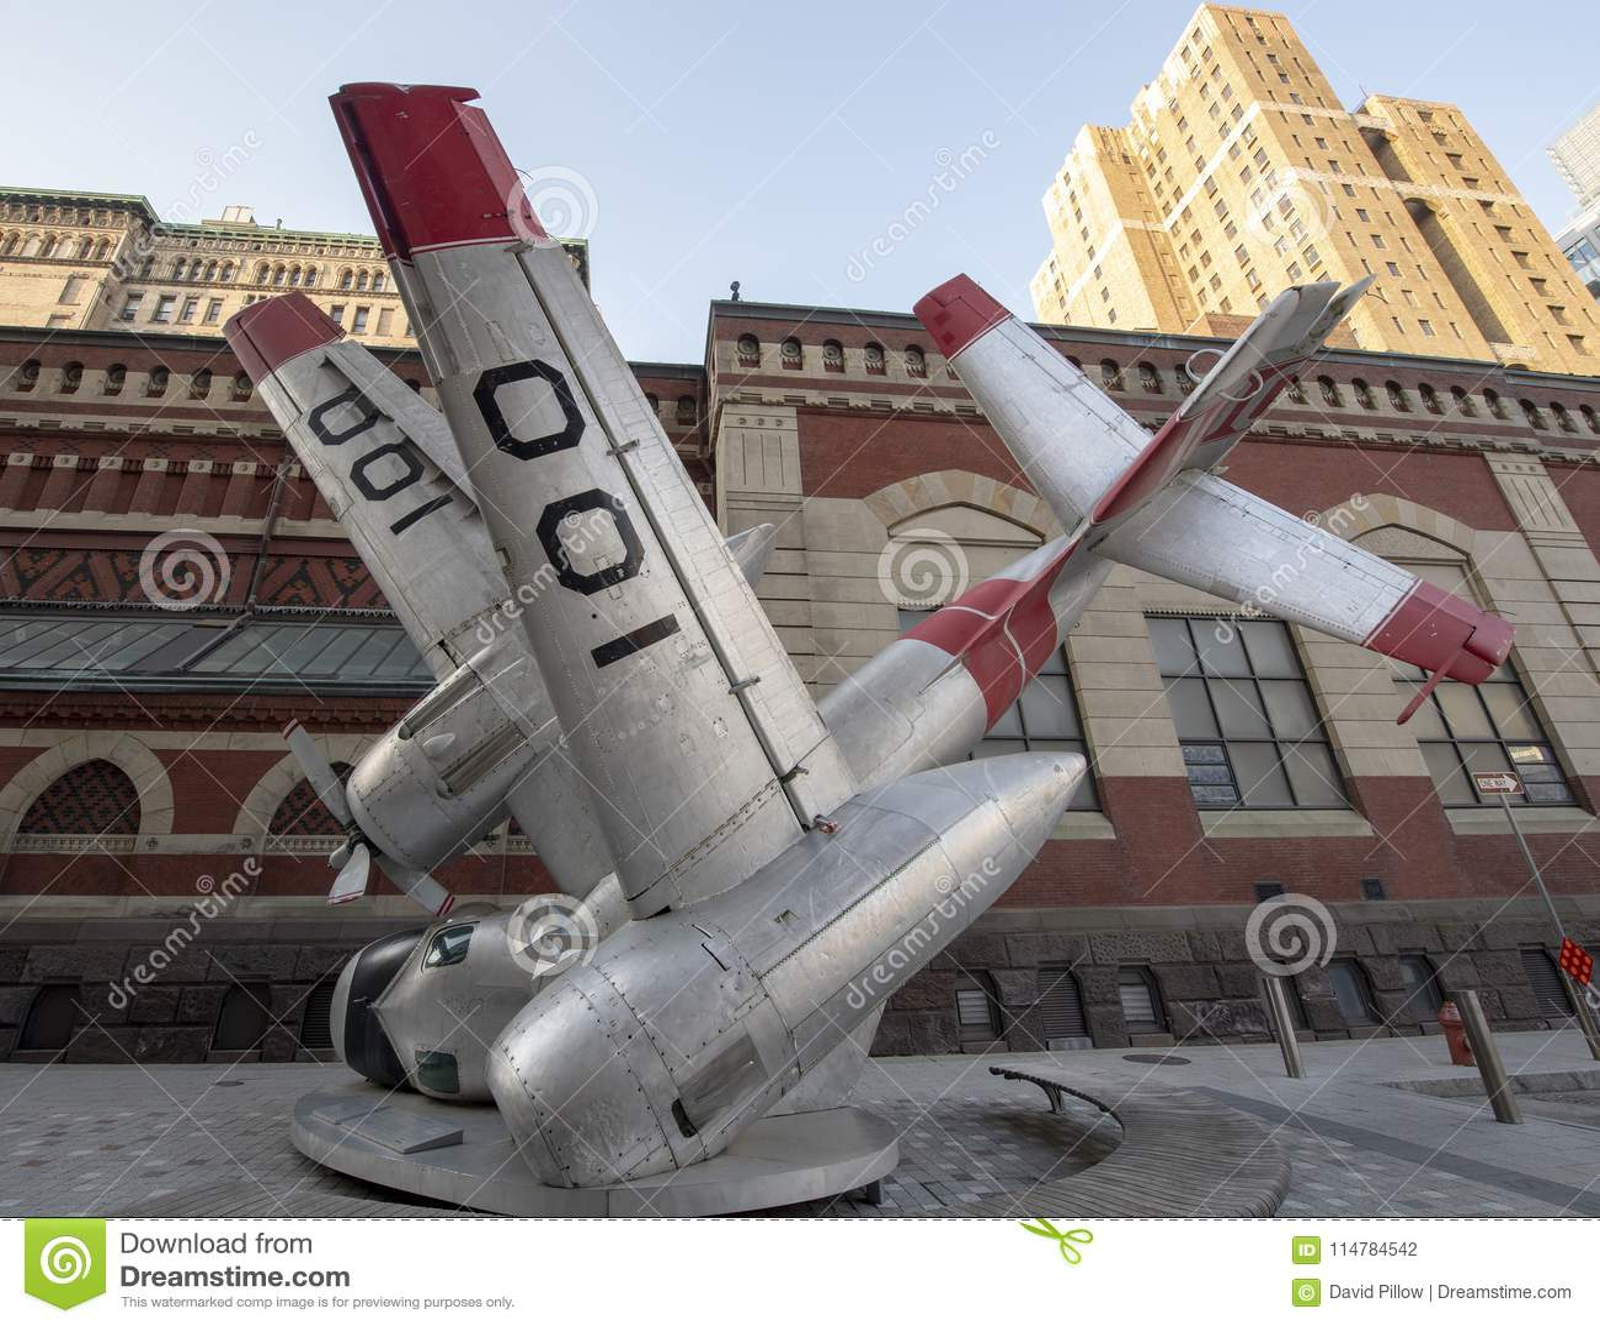 Zerschmettertes Flugzeug, Straßenkunst durch Jordan Griska, Philadelphia